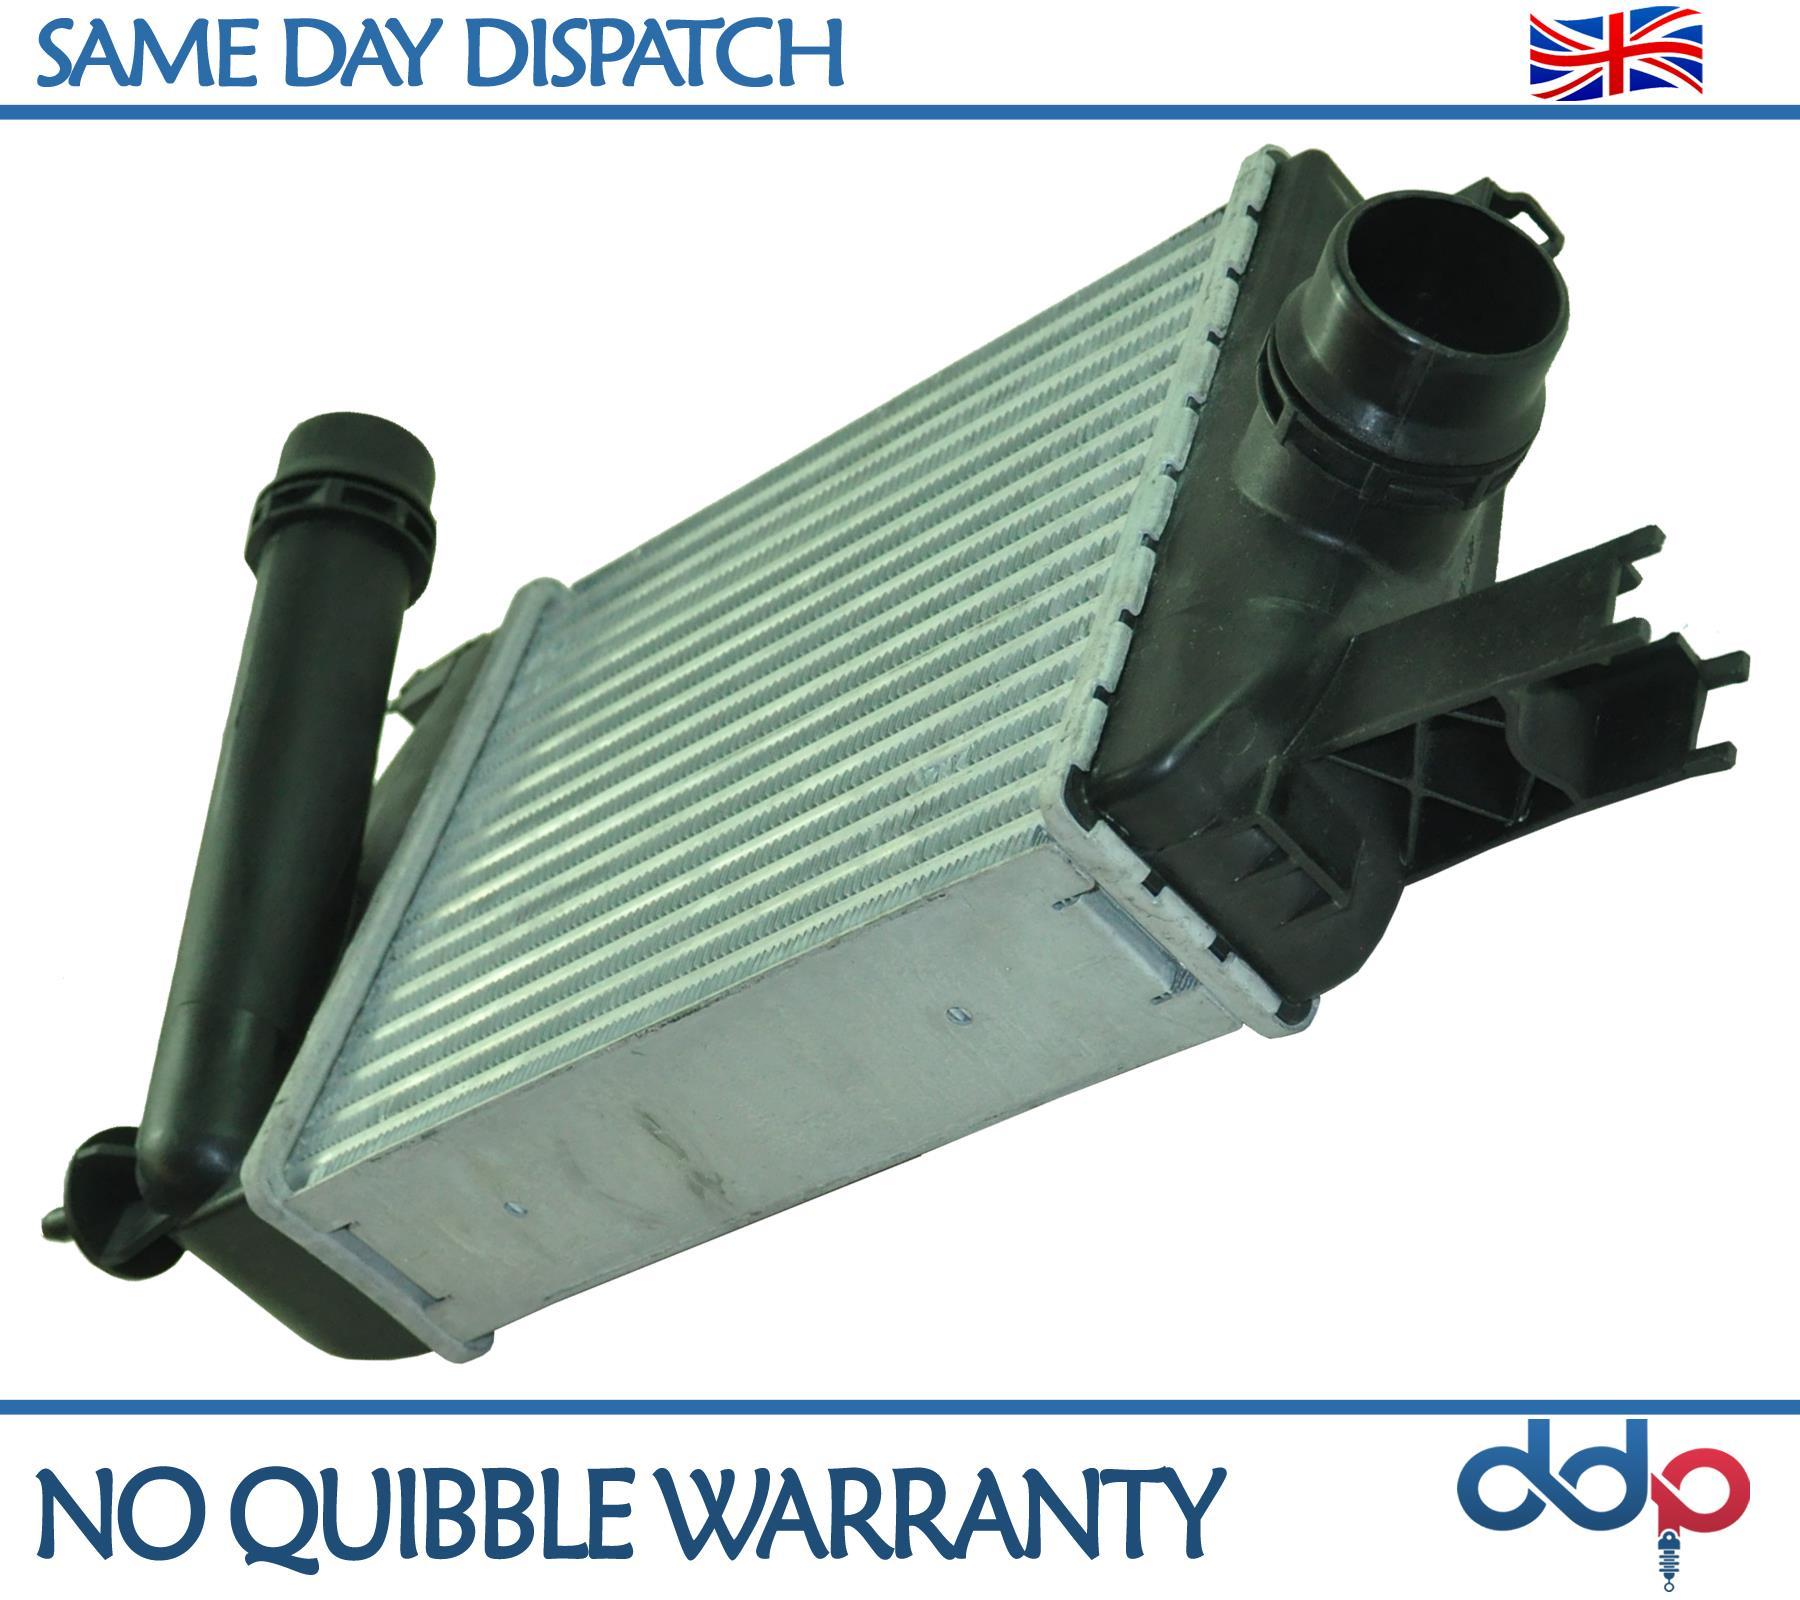 Turbo tuyau tuyau LADELUFT Manifold pour Dacia Dokker Lodgy 1.5 dCi